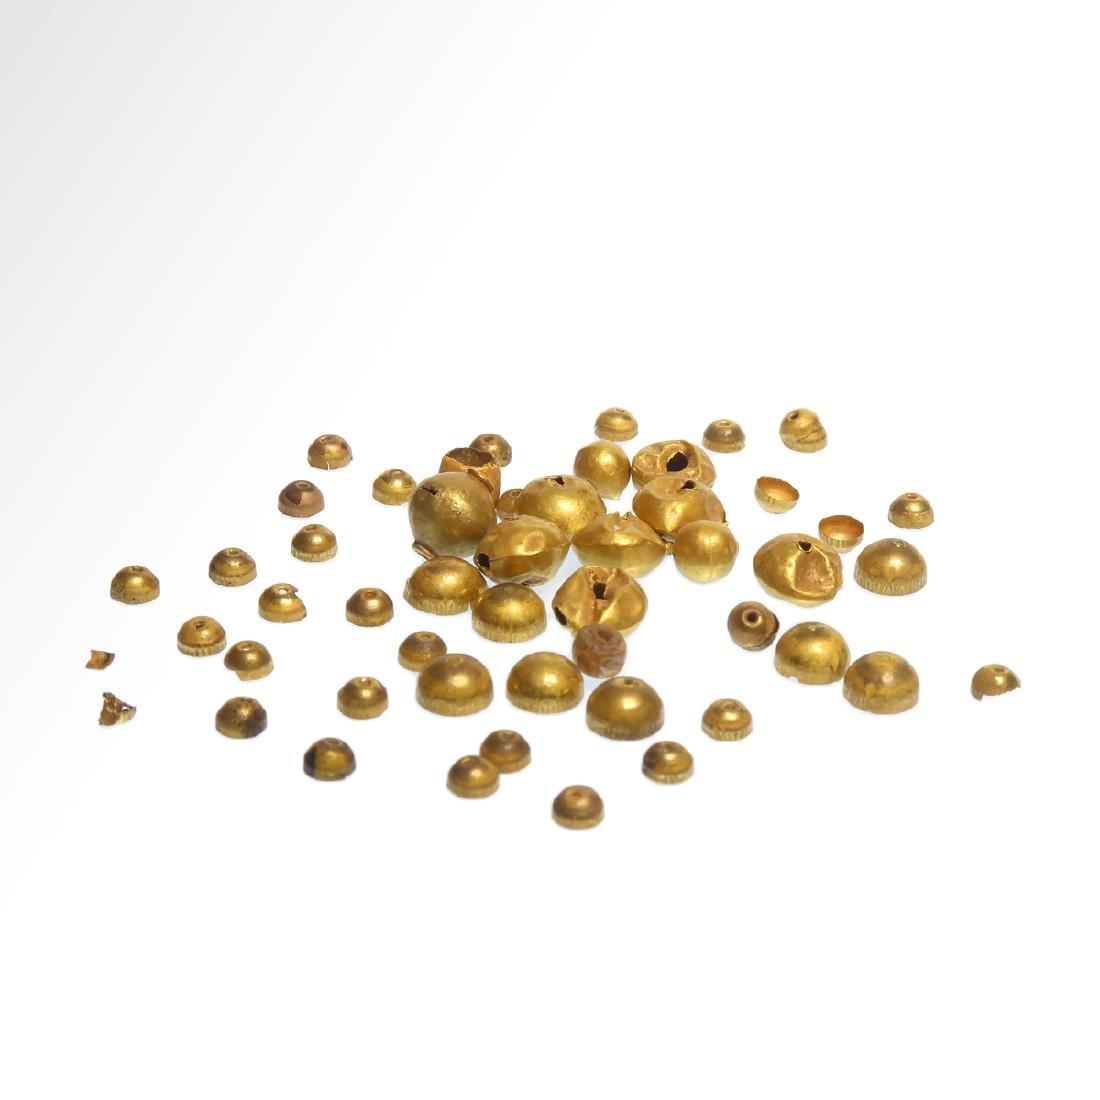 Forty-nine Roman Gold Beads, c. 1st Century A.D.